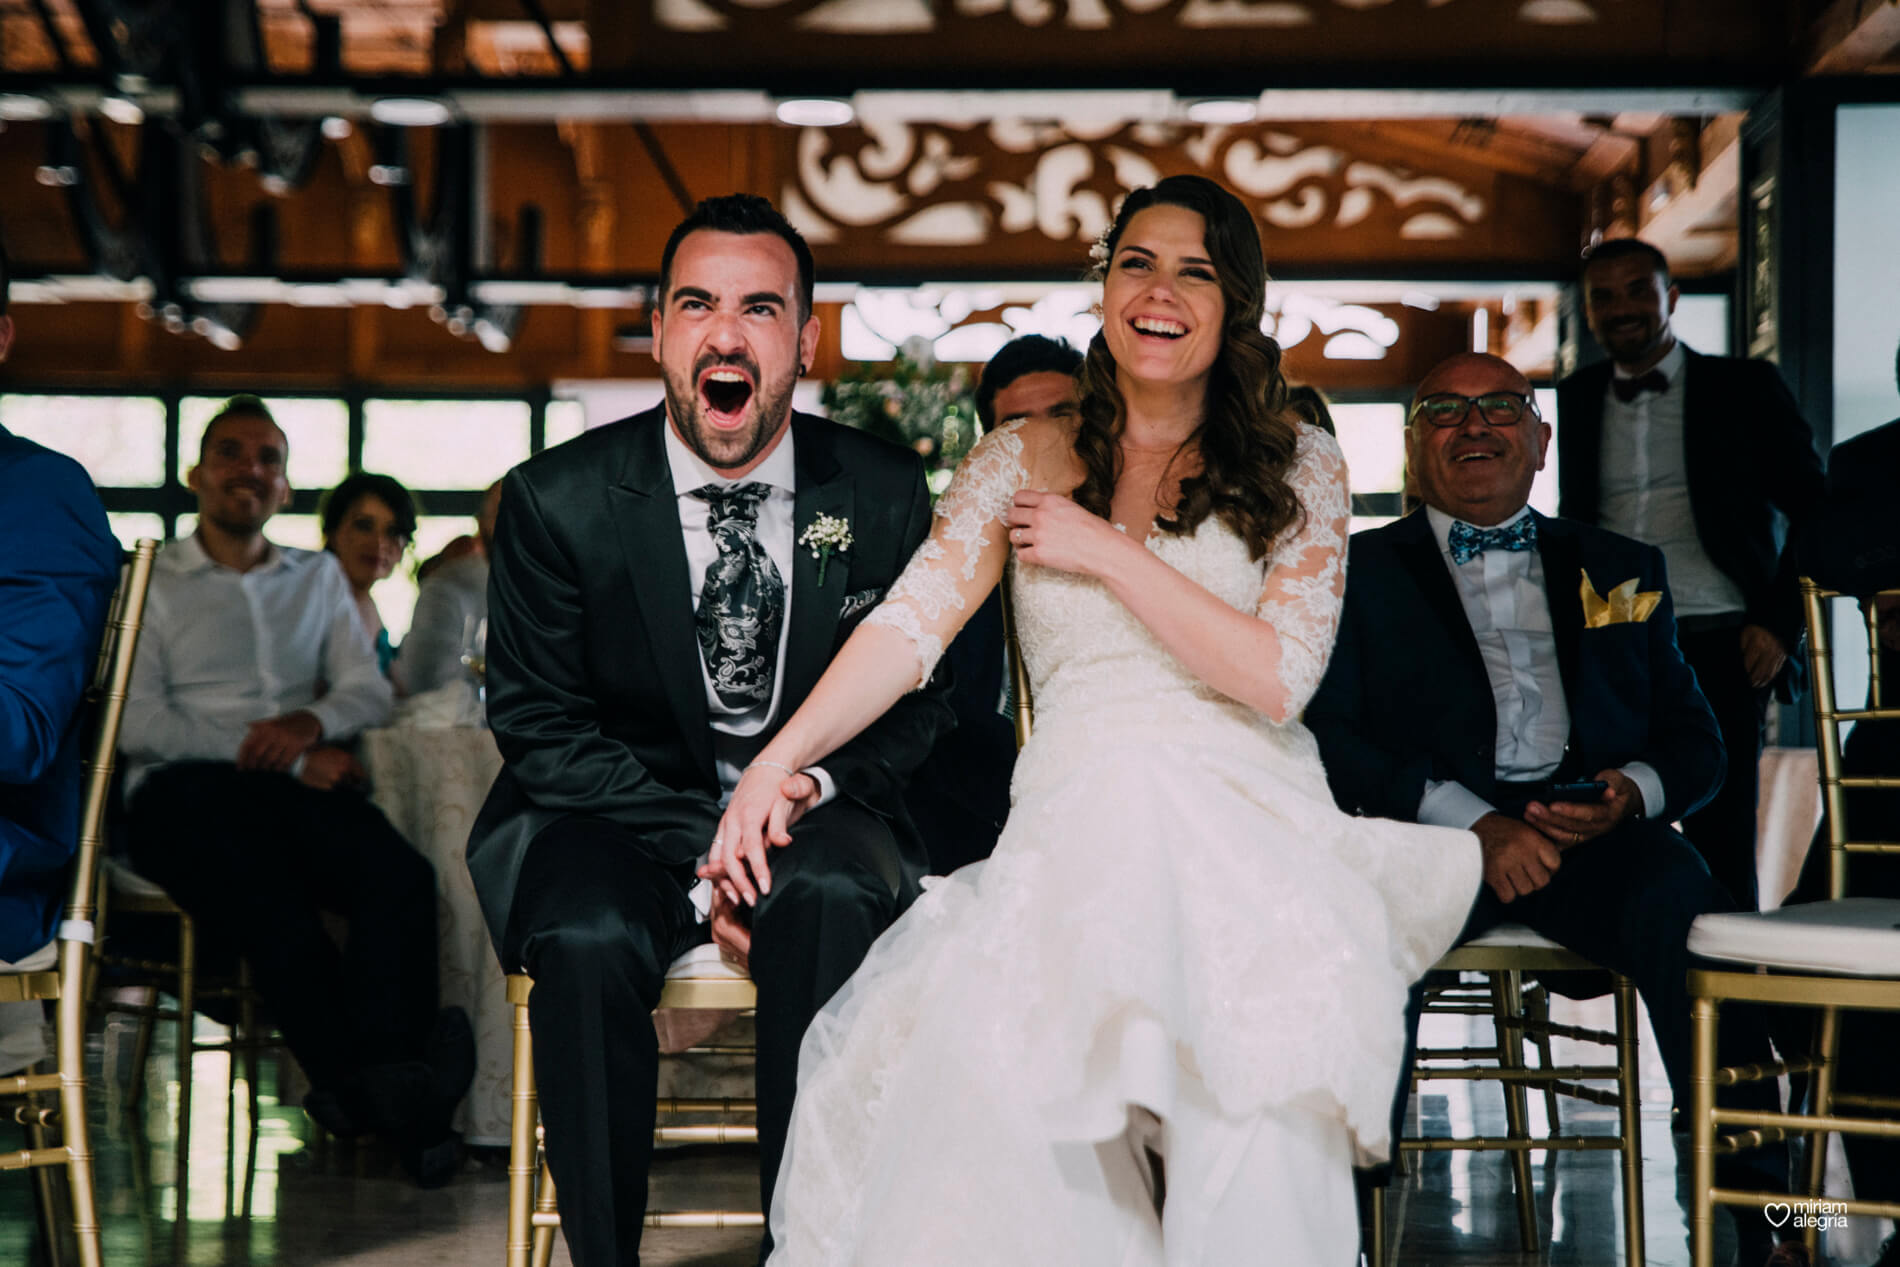 boda-en-finca-jurosa-miriam-alegria-117